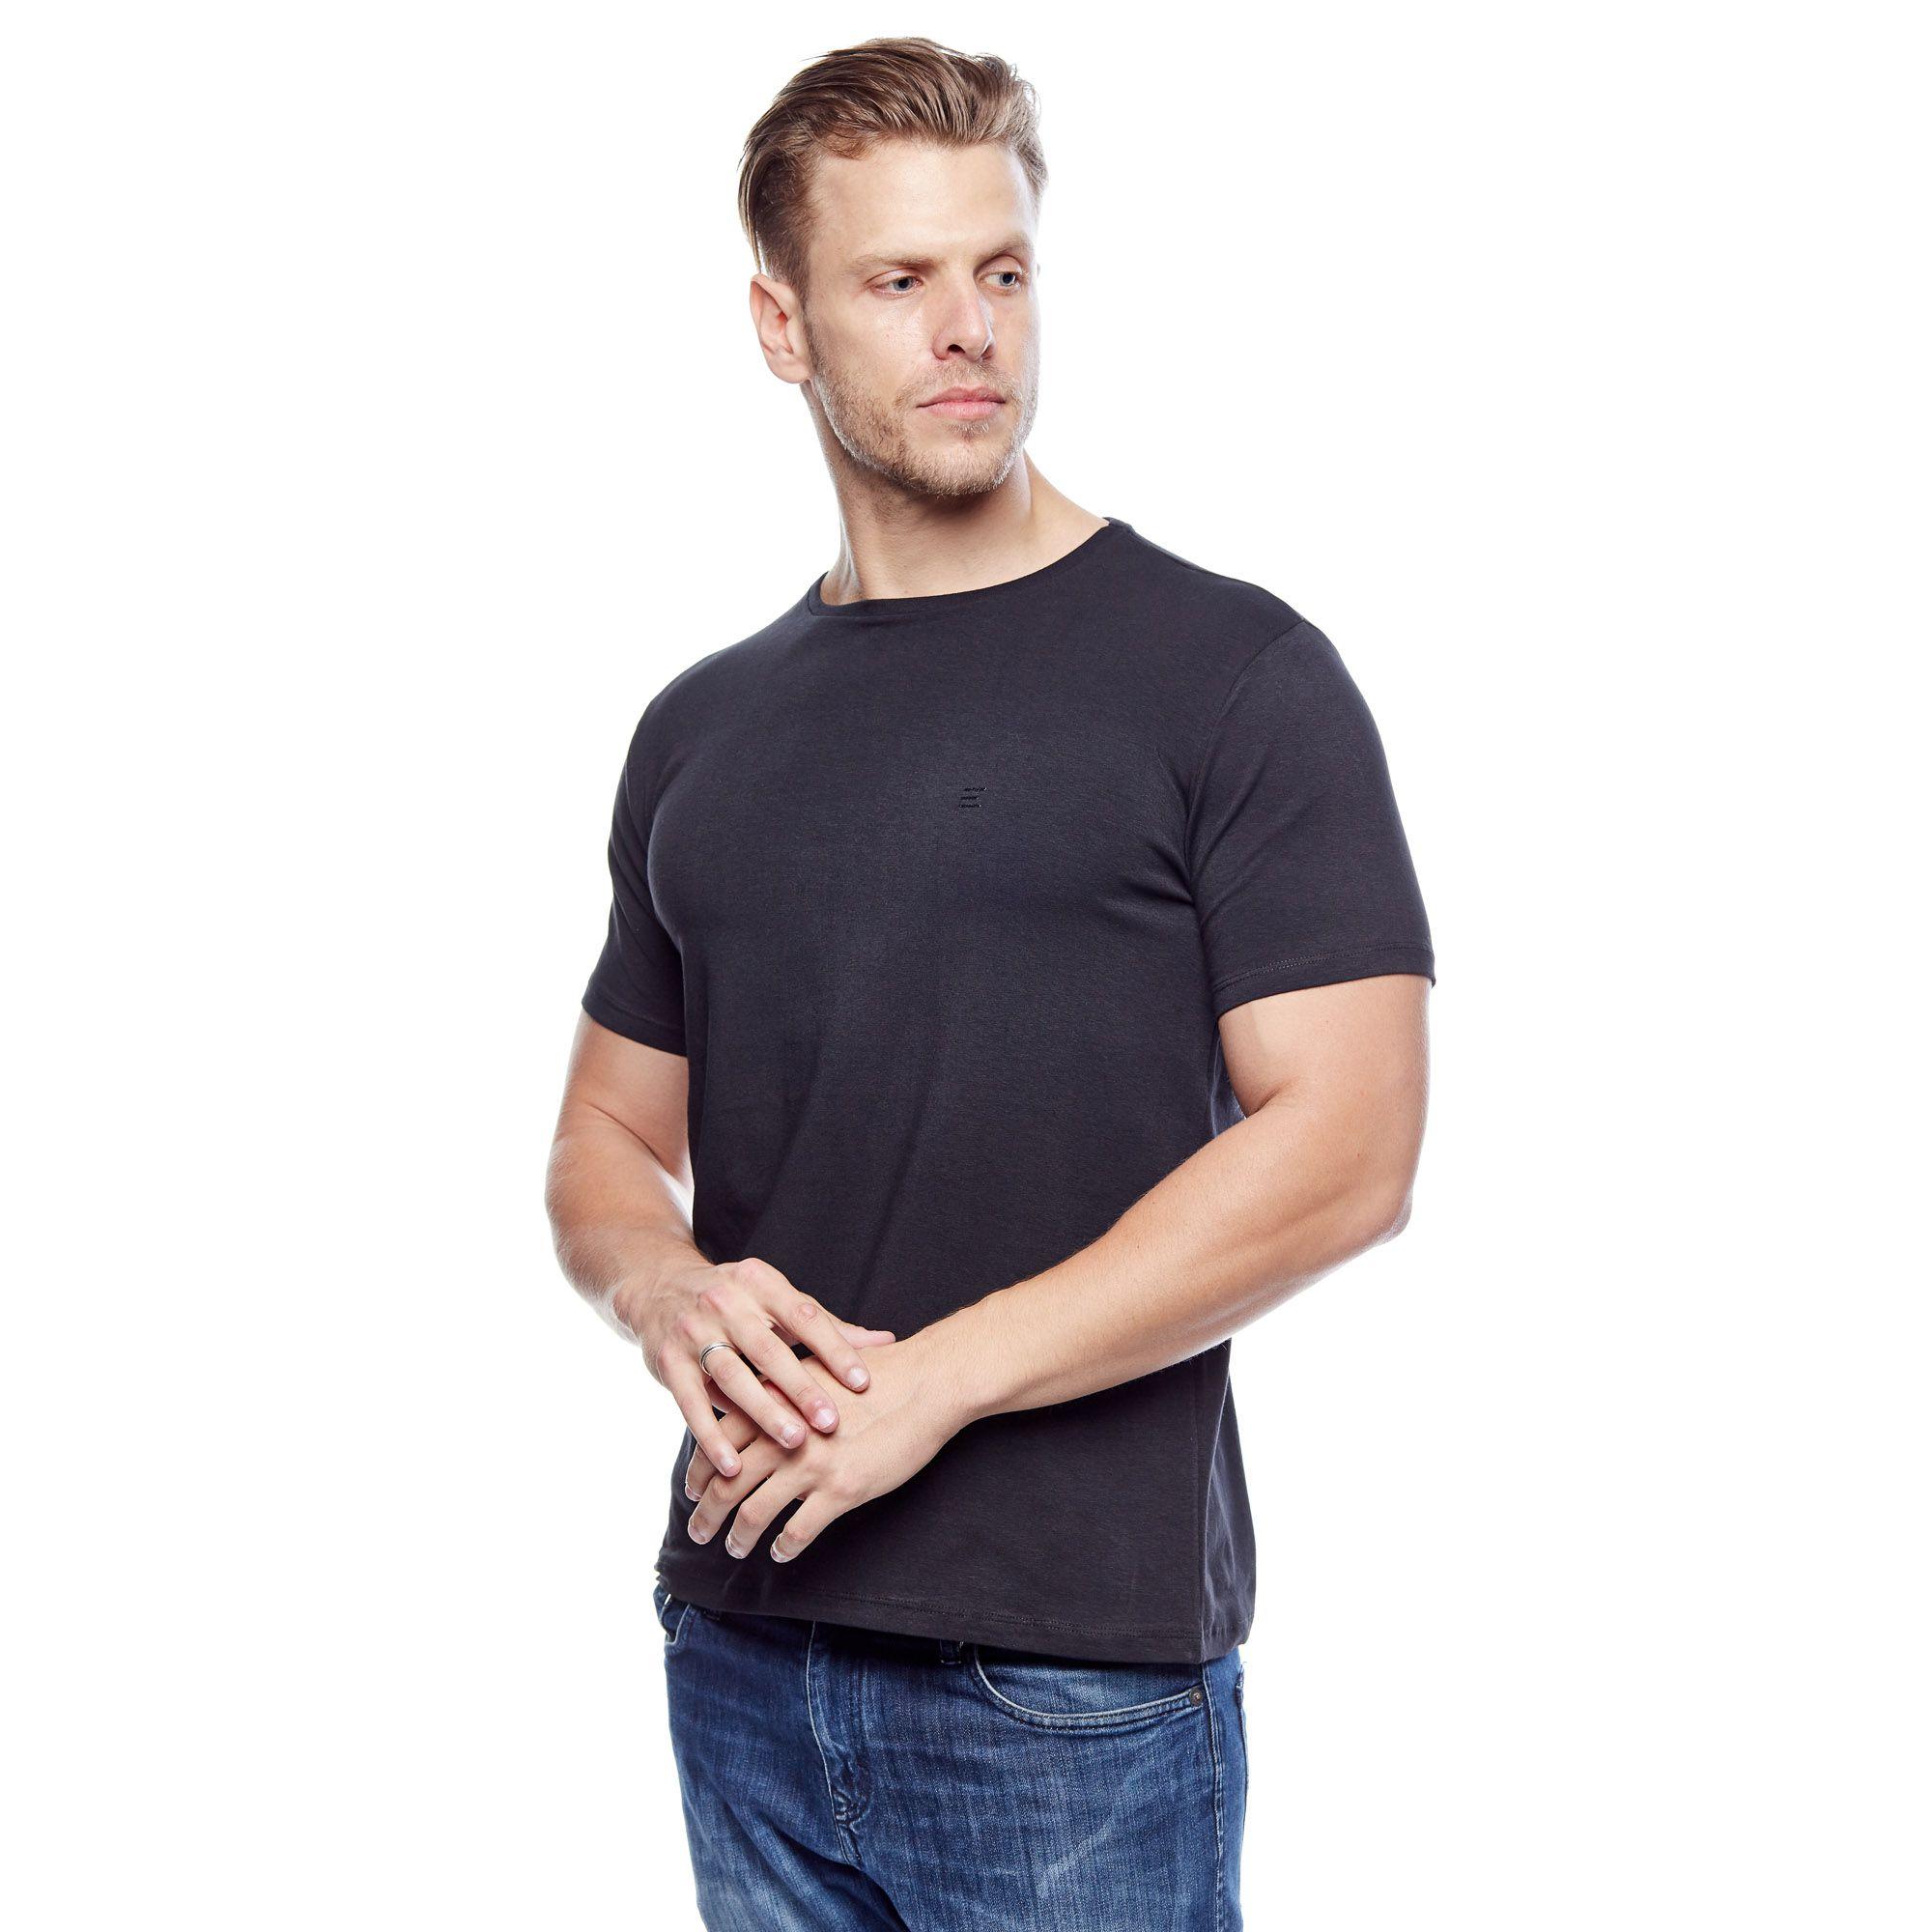 Camiseta Evolvee Cotton Lycra Masculina